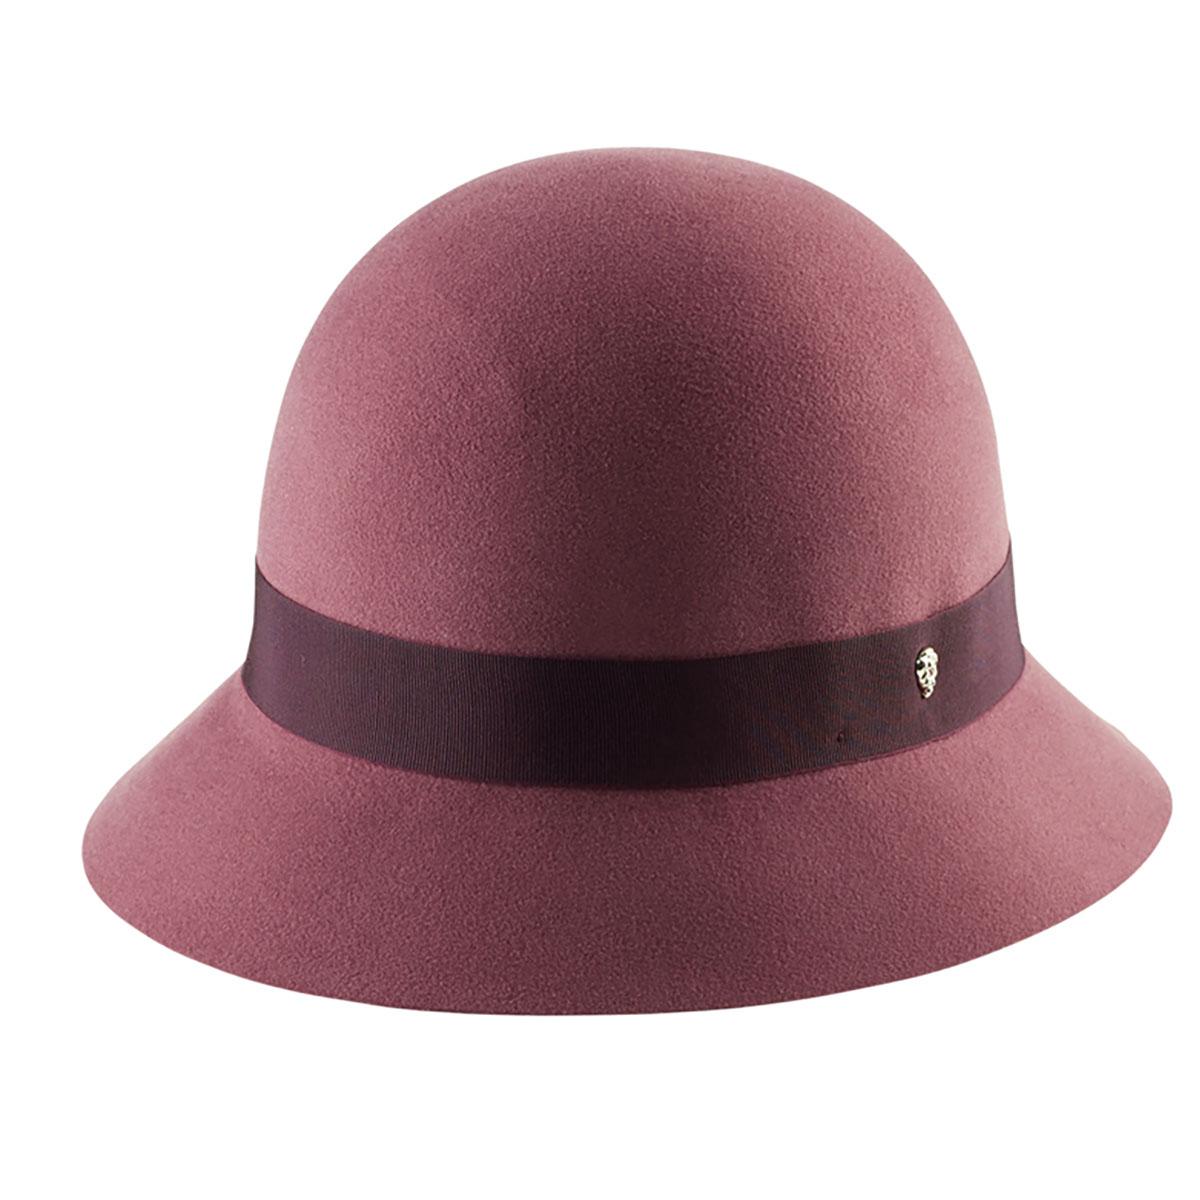 1920s Hat Styles for Women- History Beyond the Cloche Hat Etta Cloche $310.00 AT vintagedancer.com